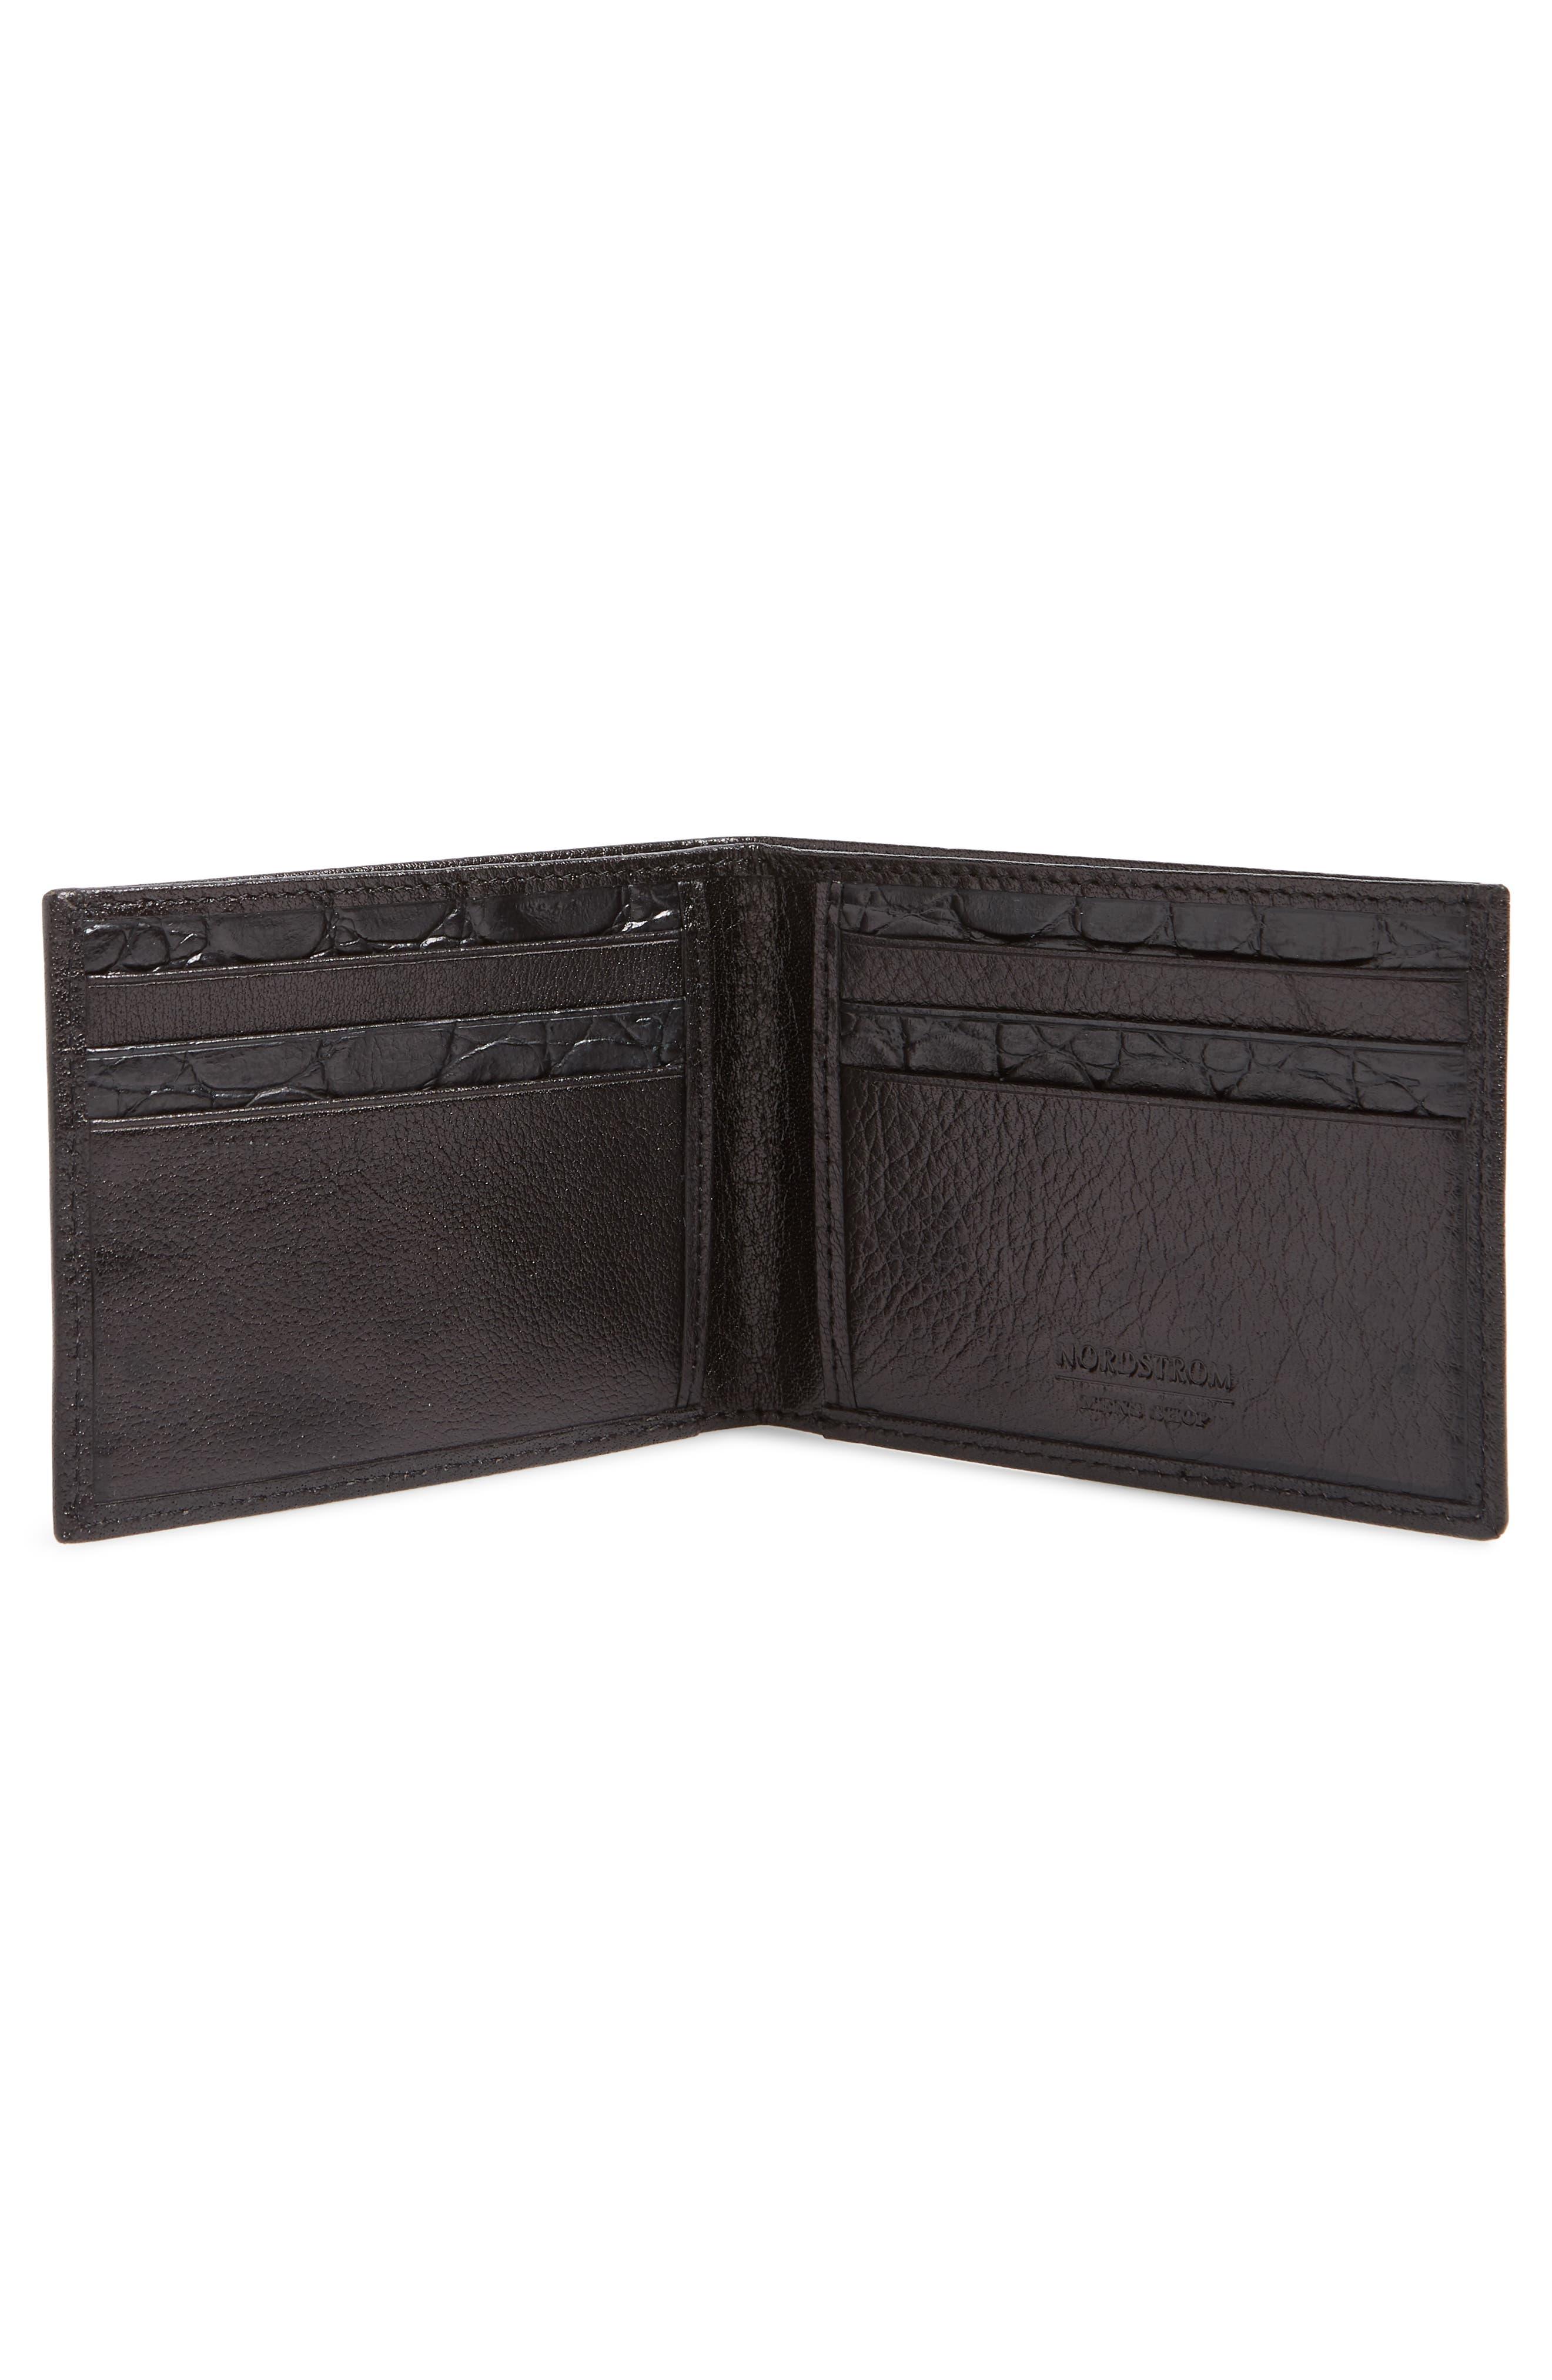 Landon Slim Leather Wallet,                             Alternate thumbnail 2, color,                             001